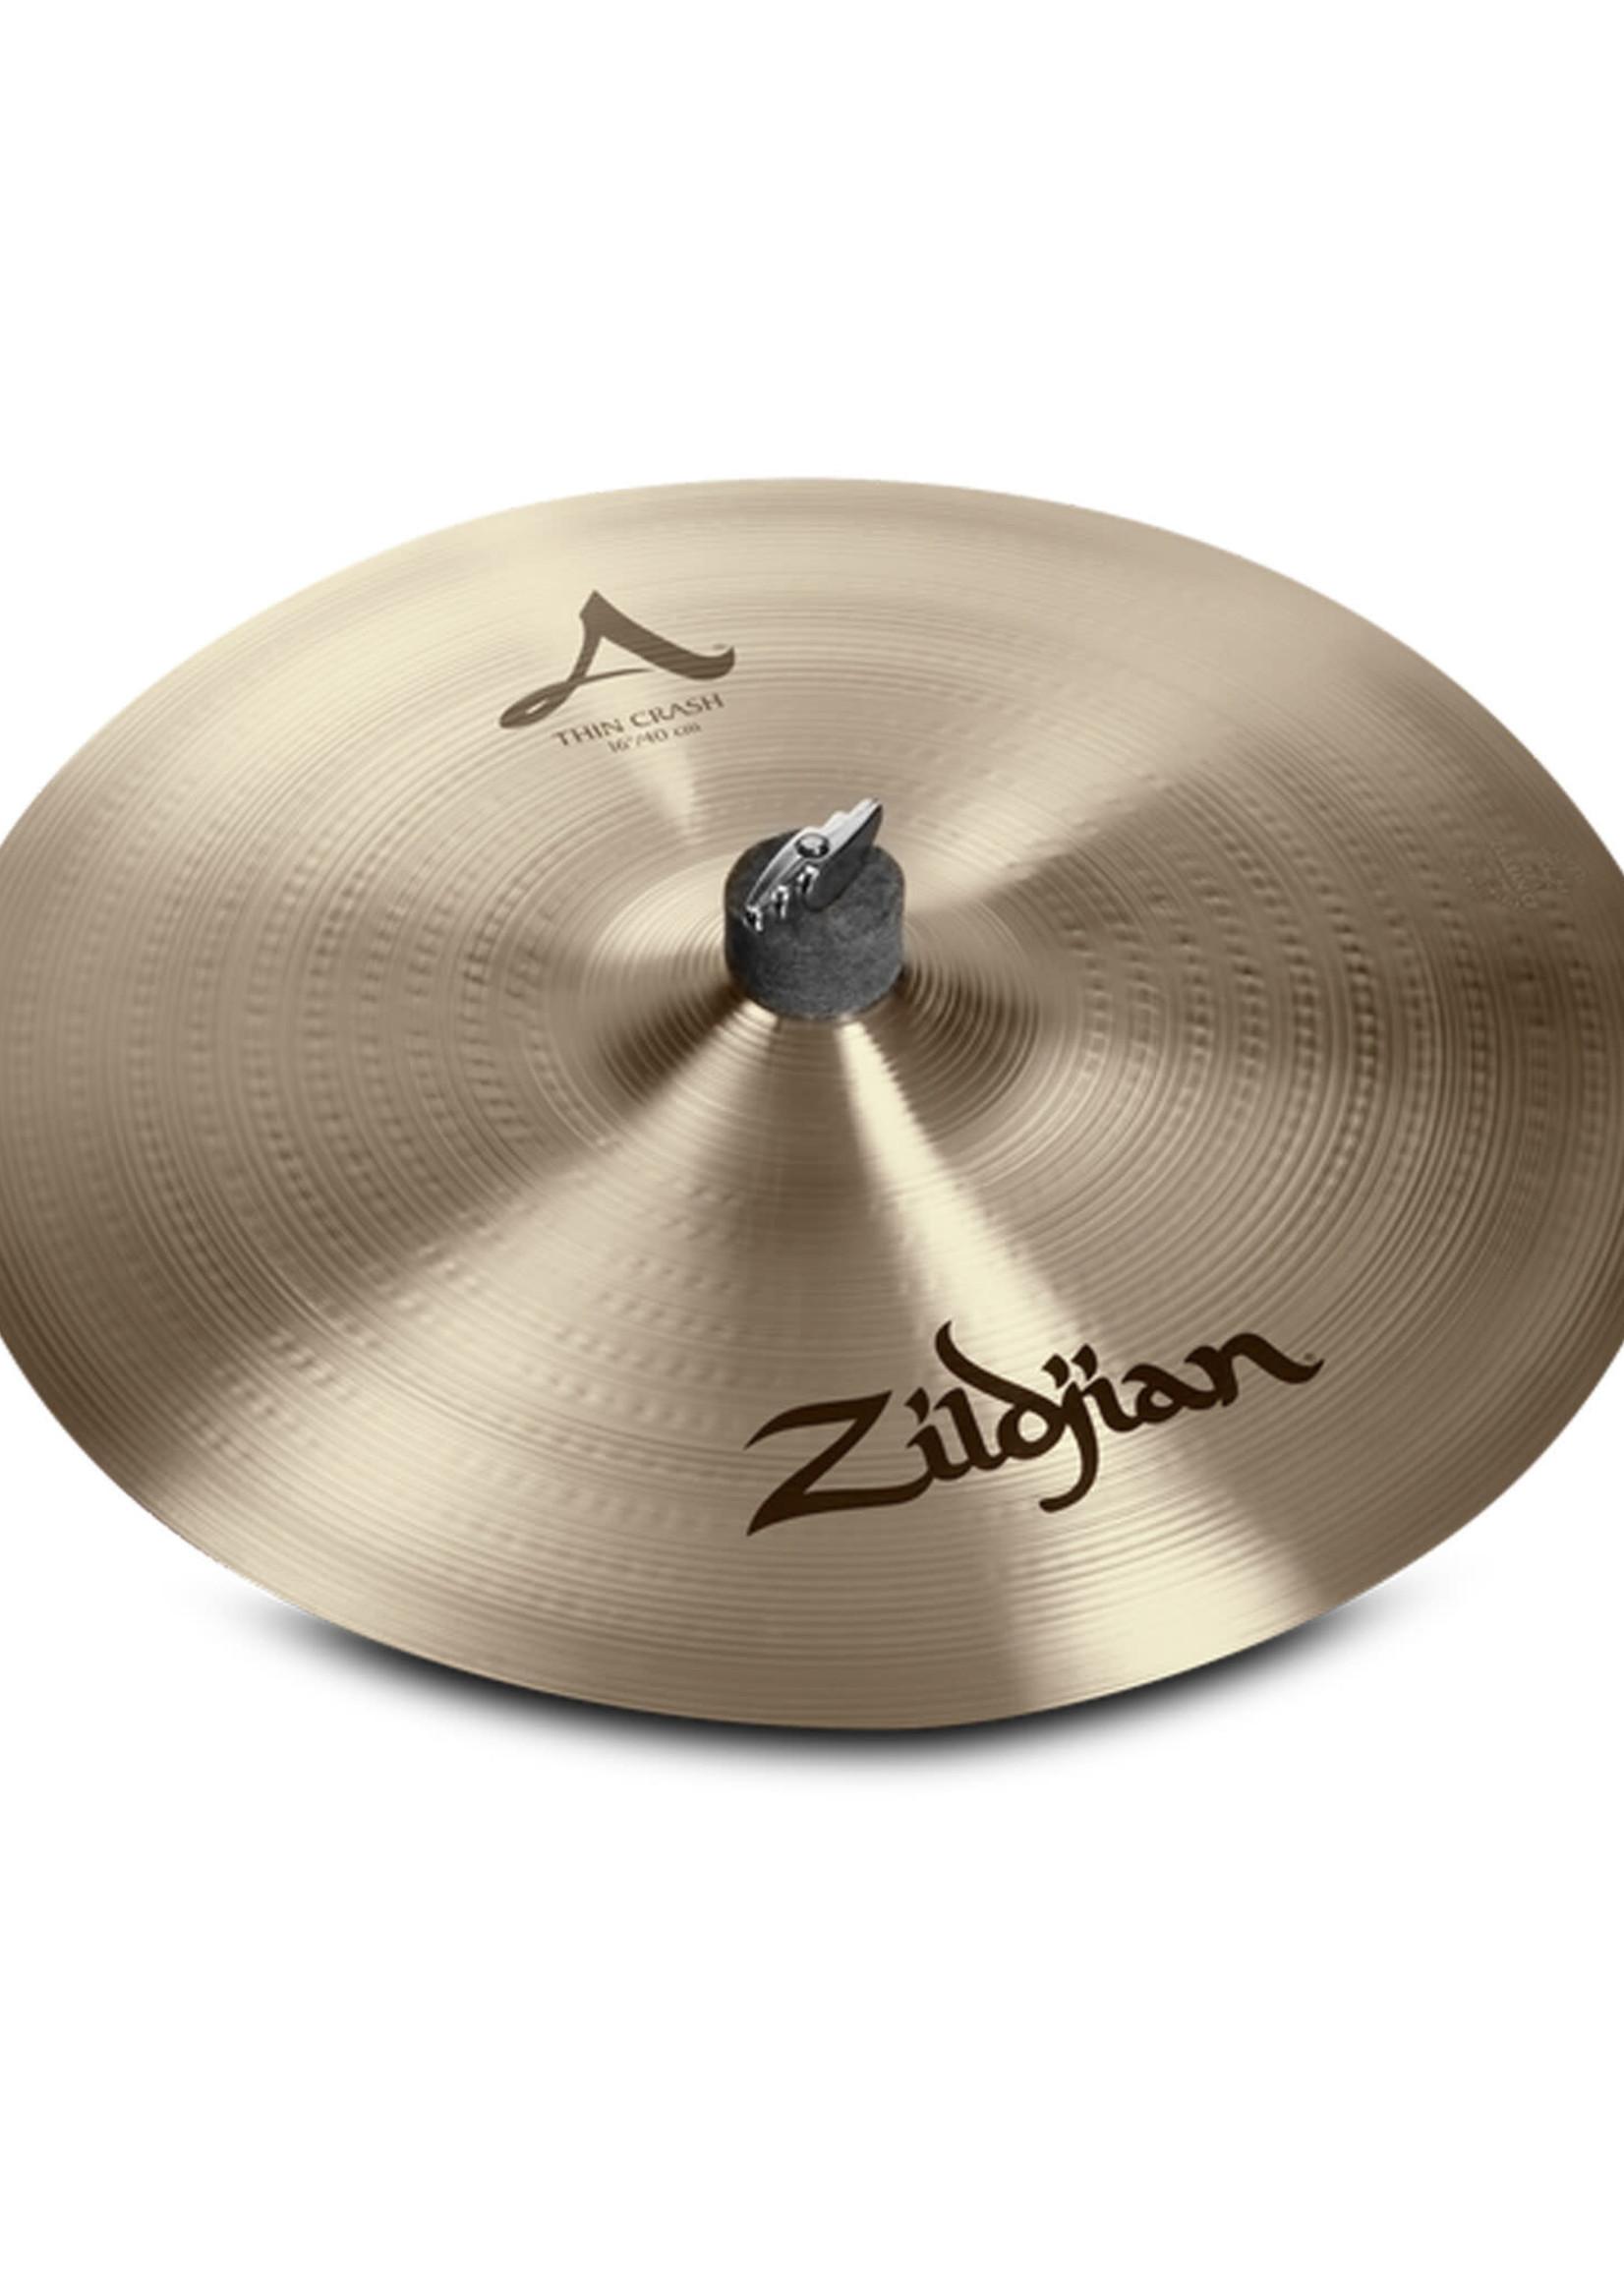 "Zildjian A Series 16"" Thin Crash"